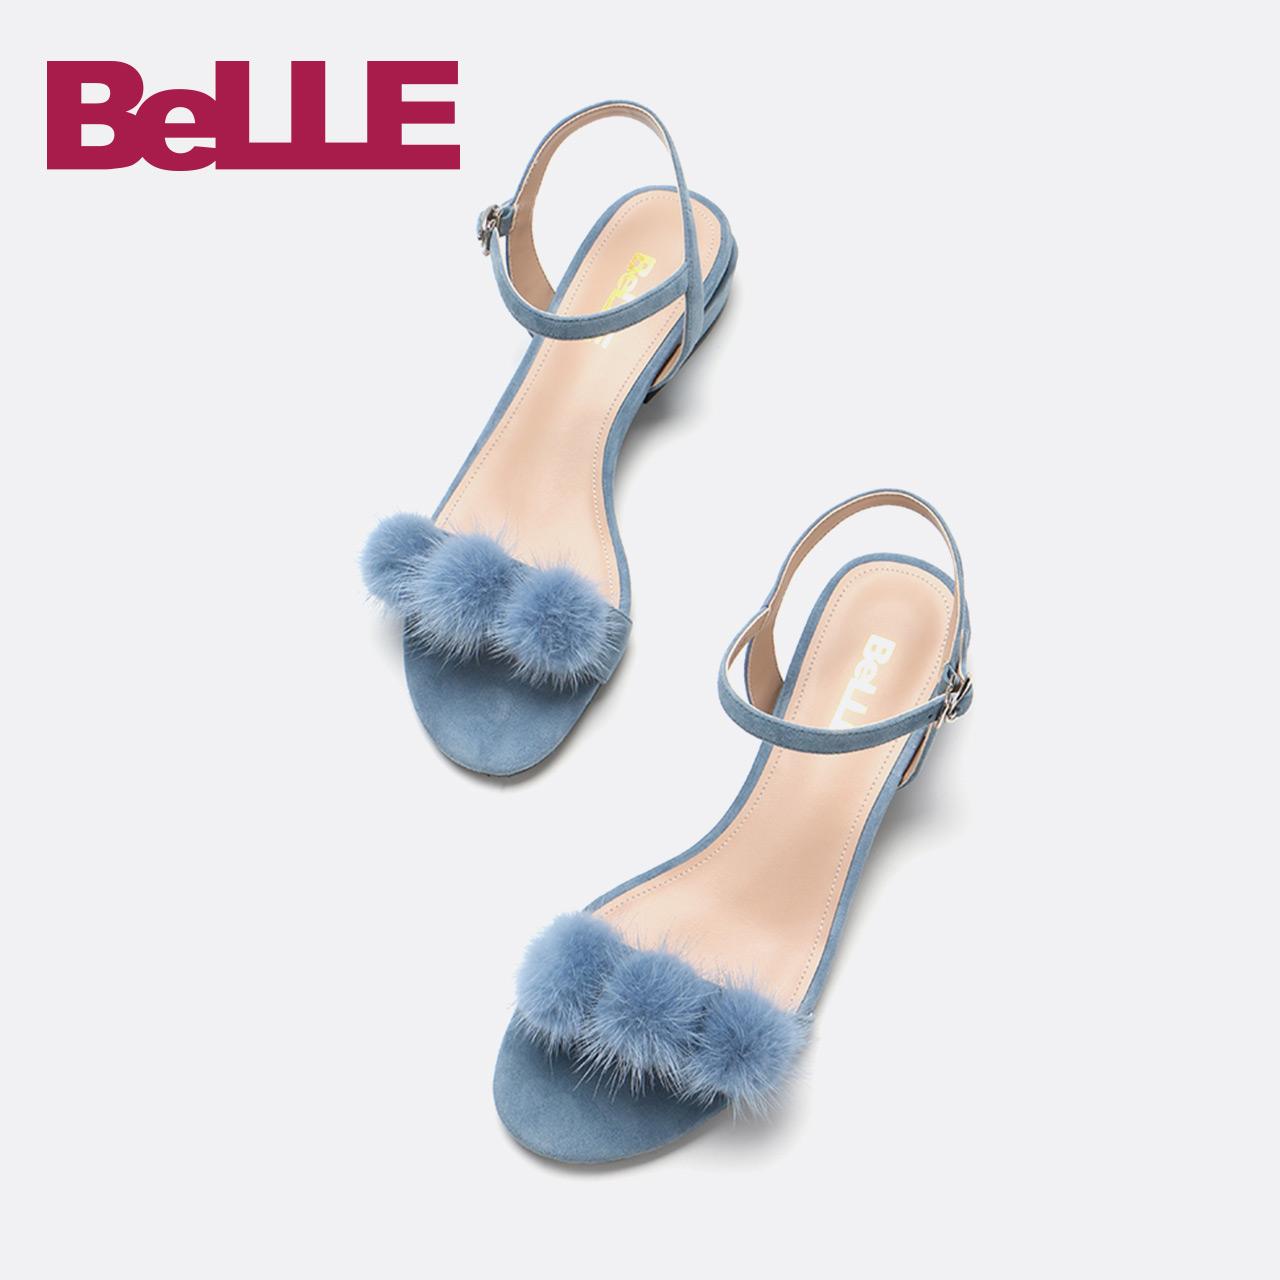 Belle-百丽凉鞋18夏新商场同款羊皮一字带平底女鞋BXL30BL8